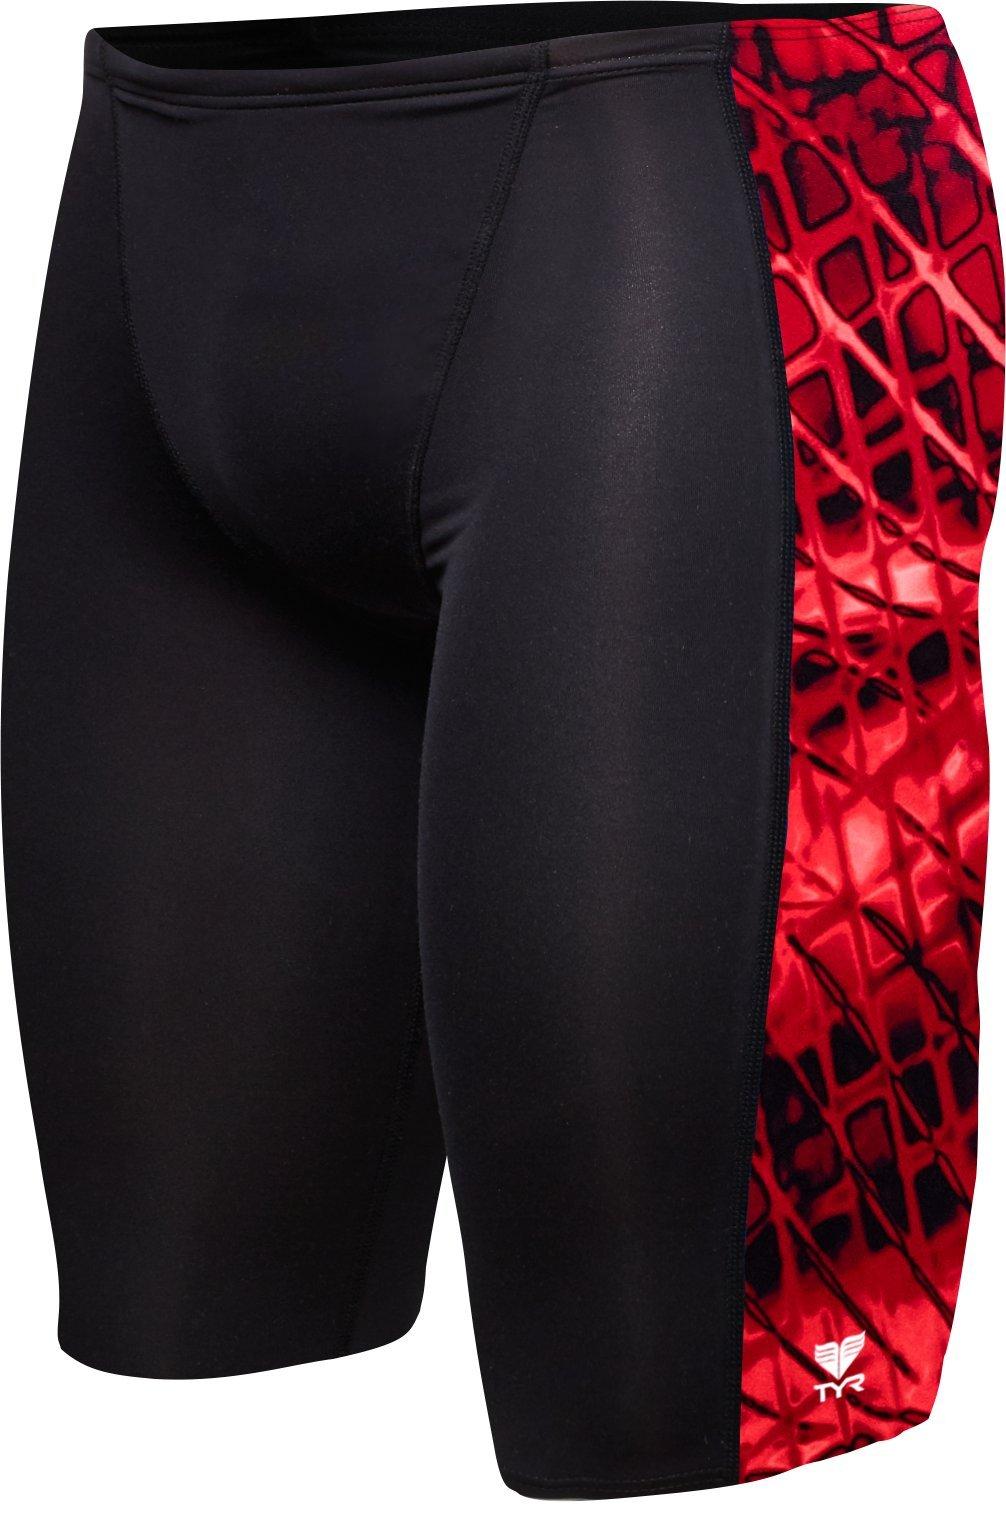 TYR Men's Plexus Hero Jammer Swimsuit, Red, 30 by TYR